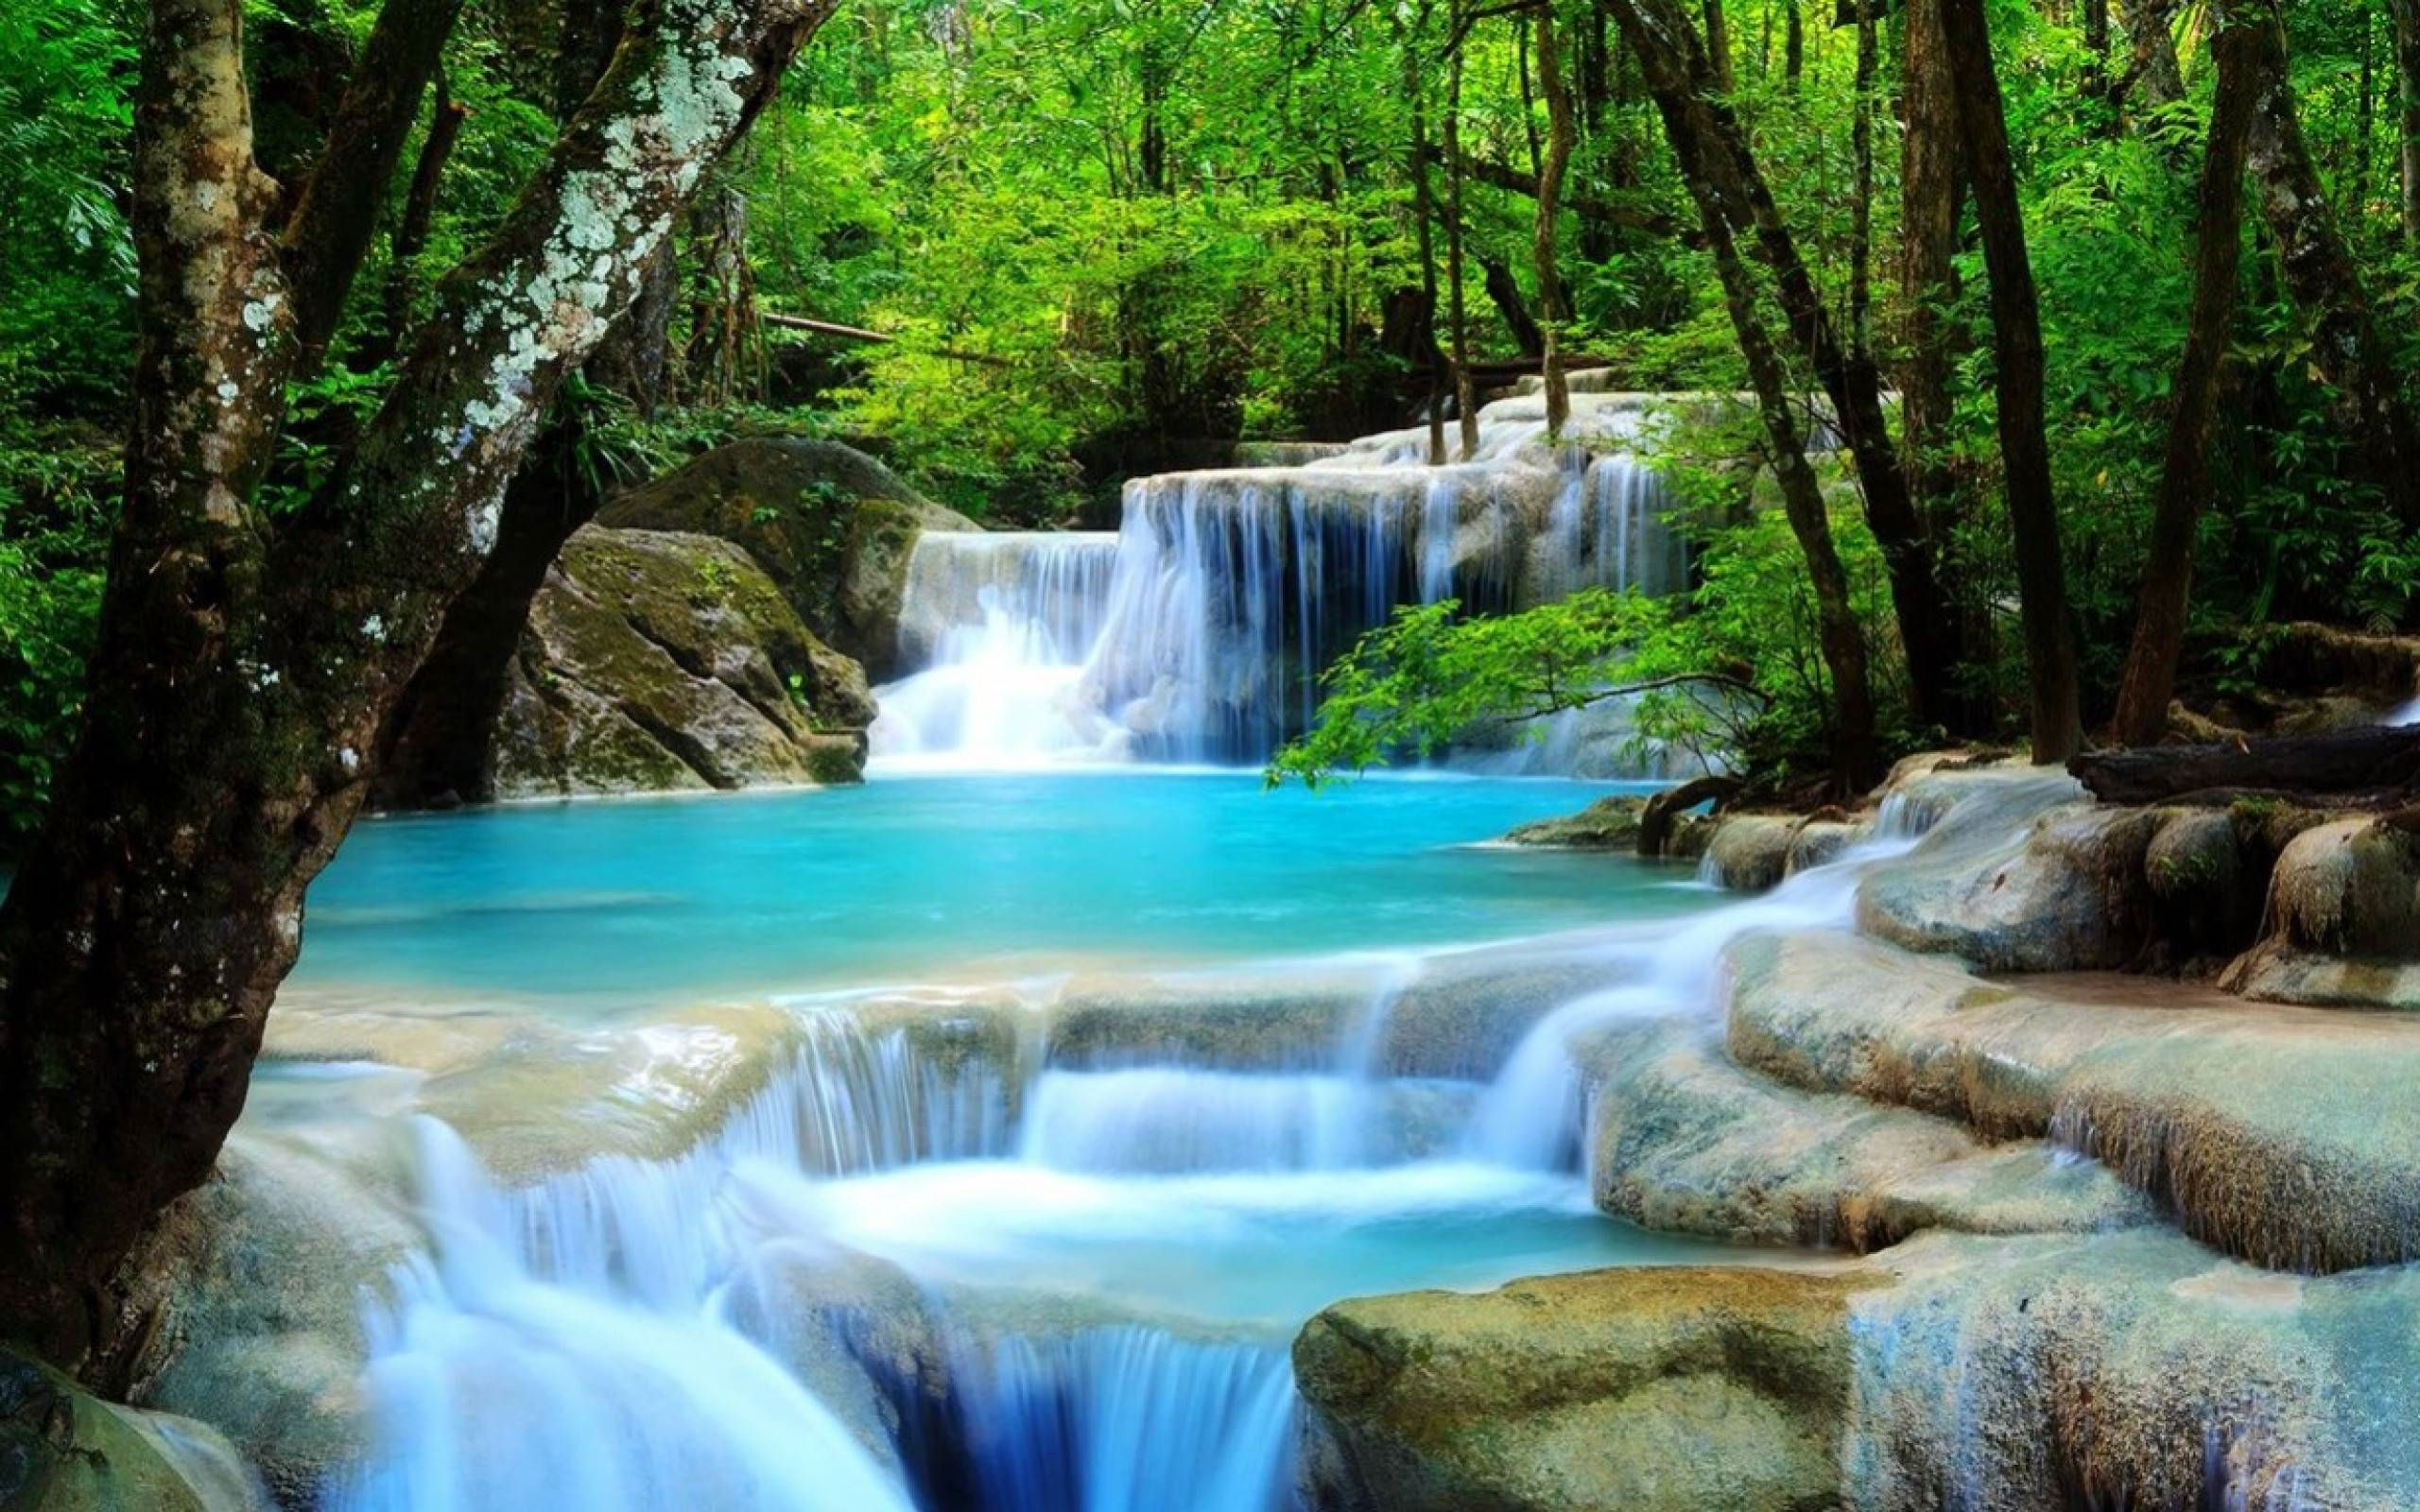 waterfall image for desktop wallpaper 2560 x 1600 px 1 2 mb